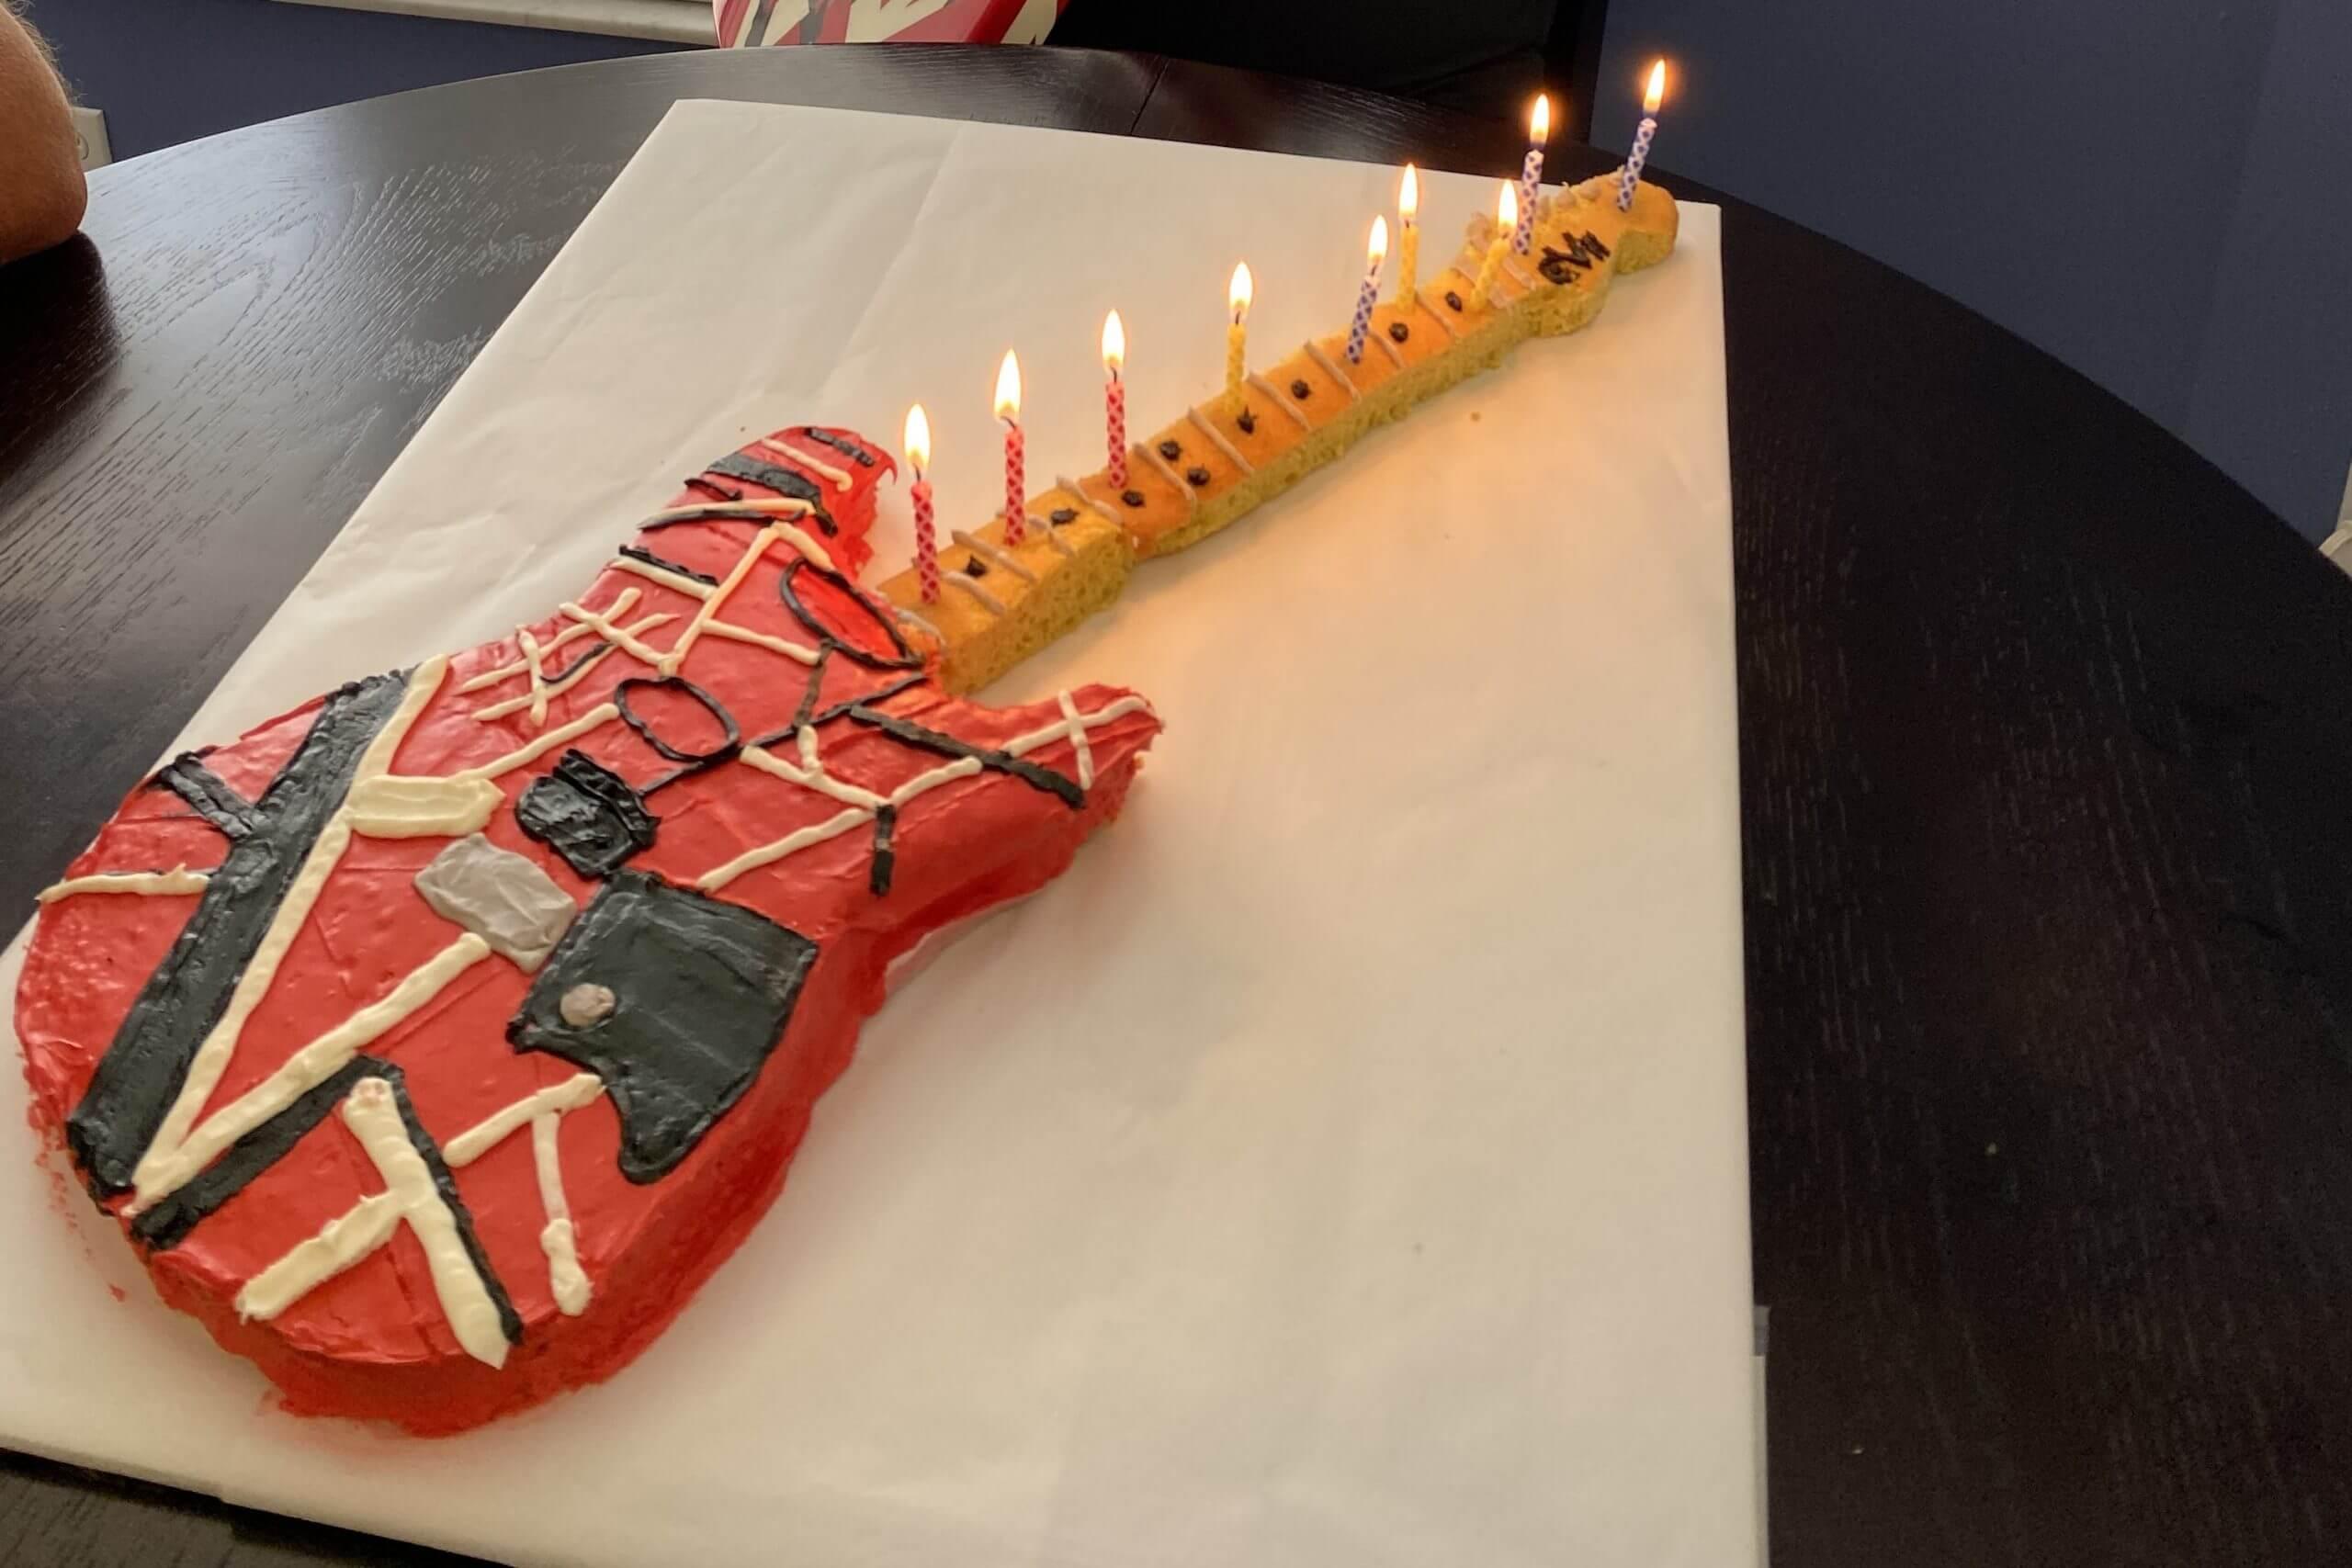 Susan prides herself on her birthday cake baking skills...